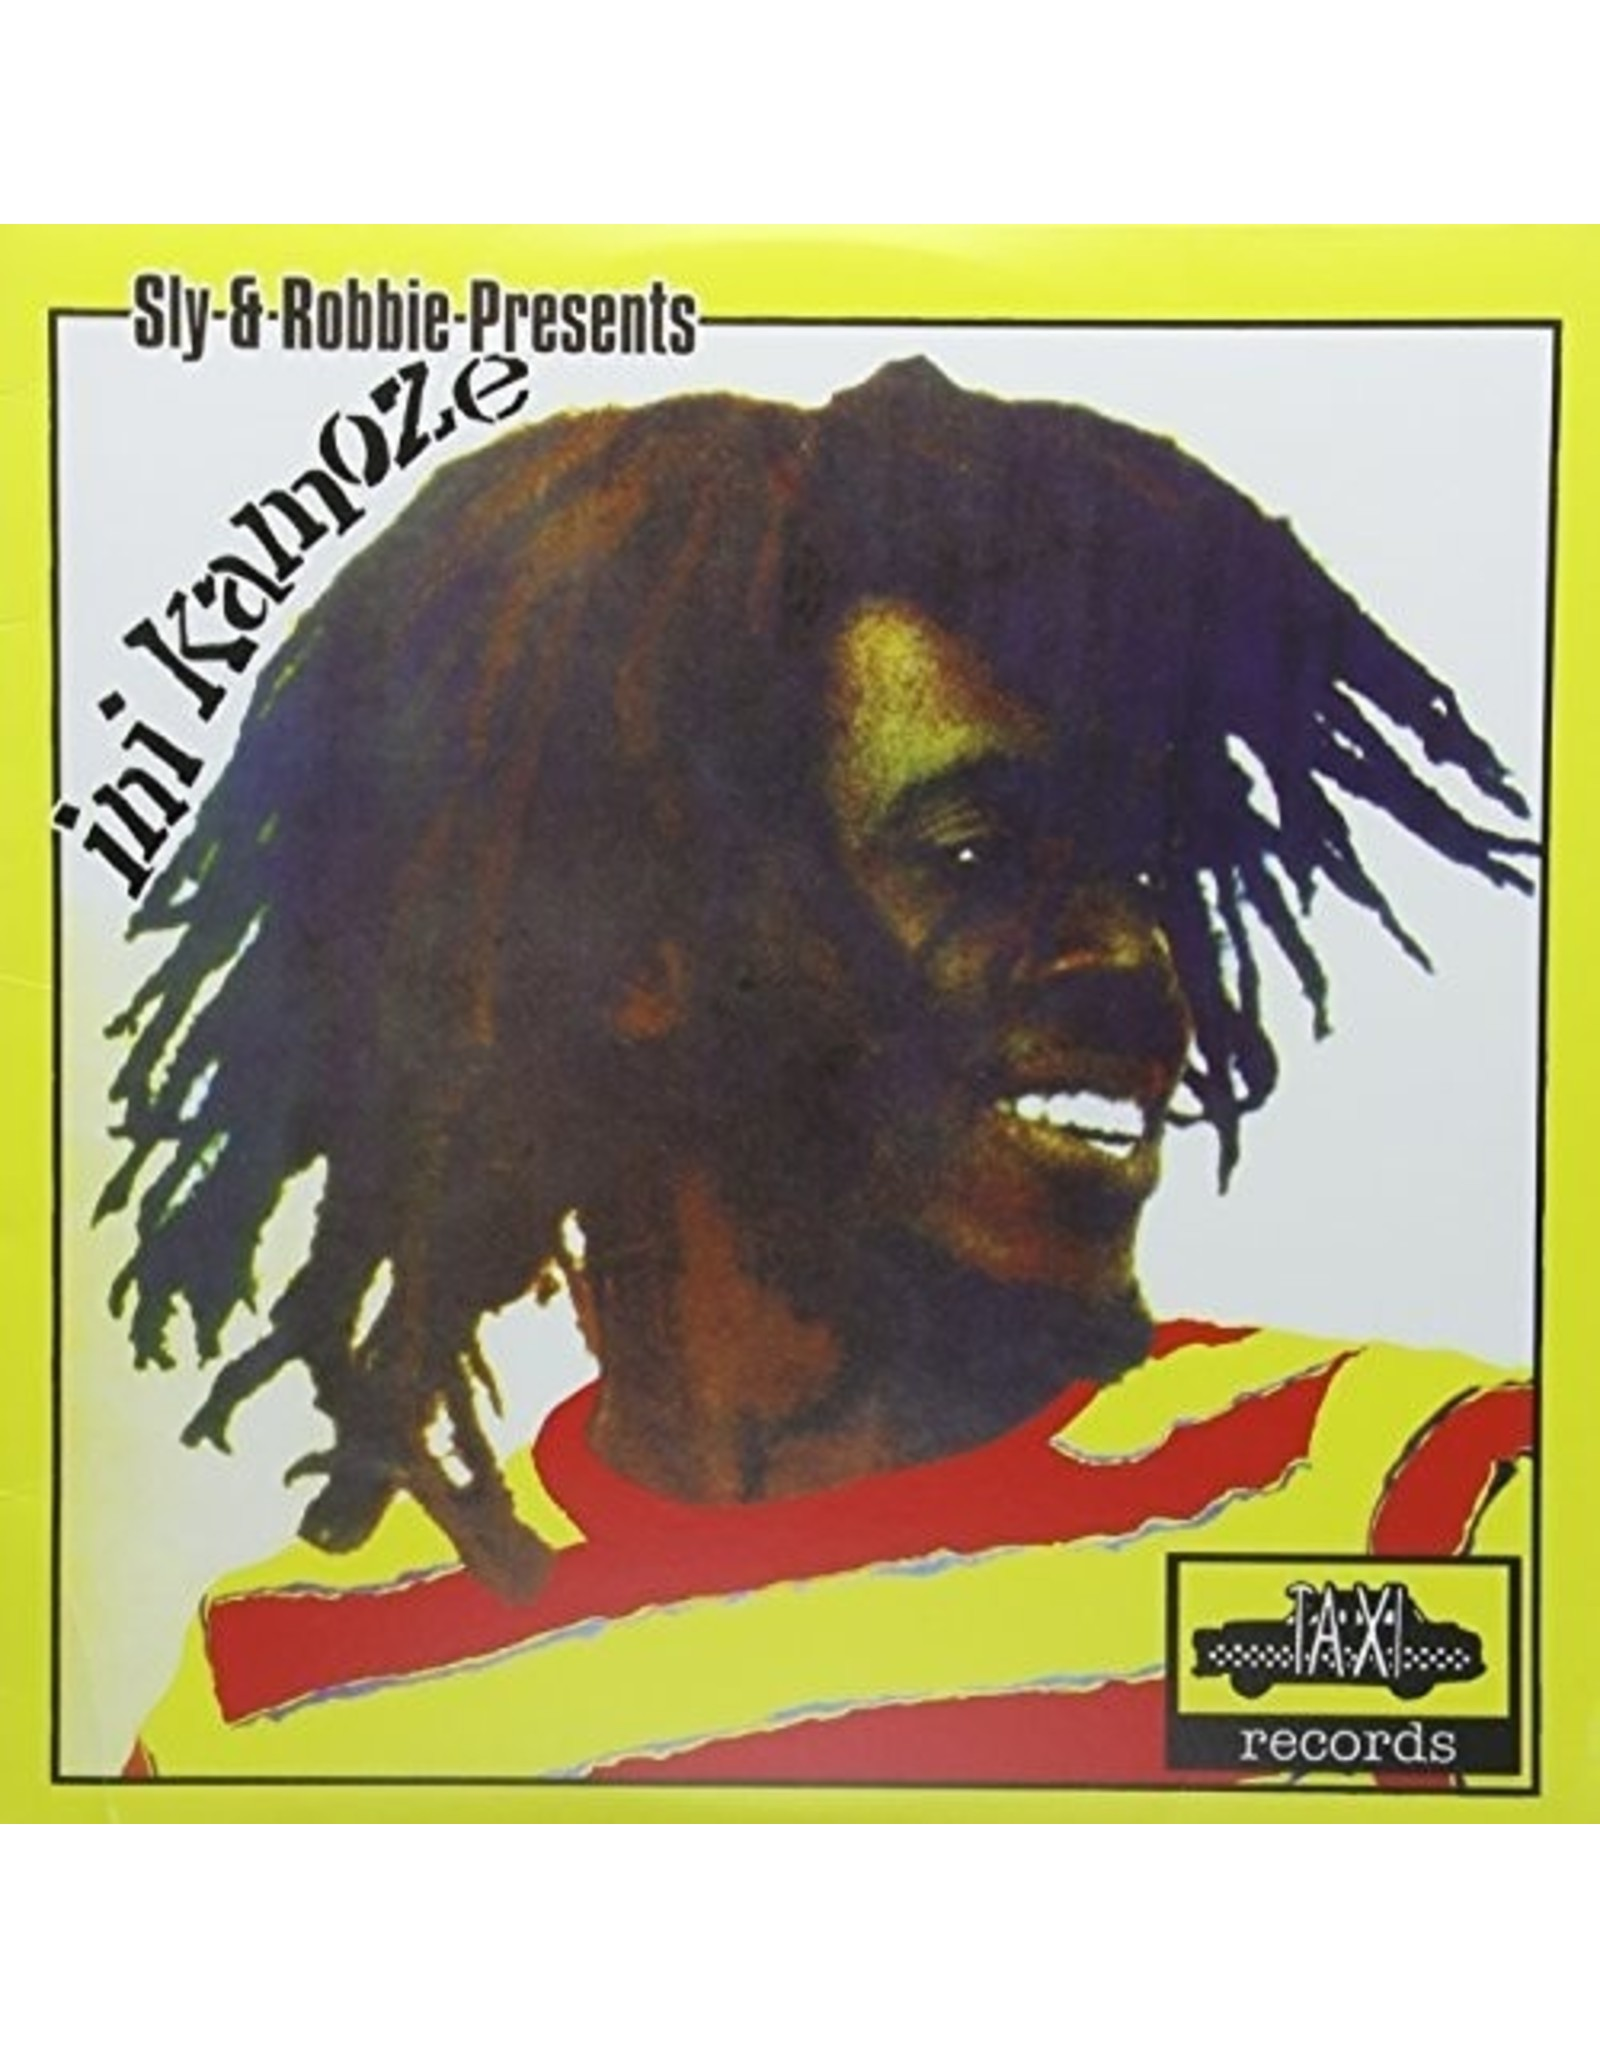 New Vinyl Ini Kamoze - Sly & Robbie Presents Ini Kamoze LP